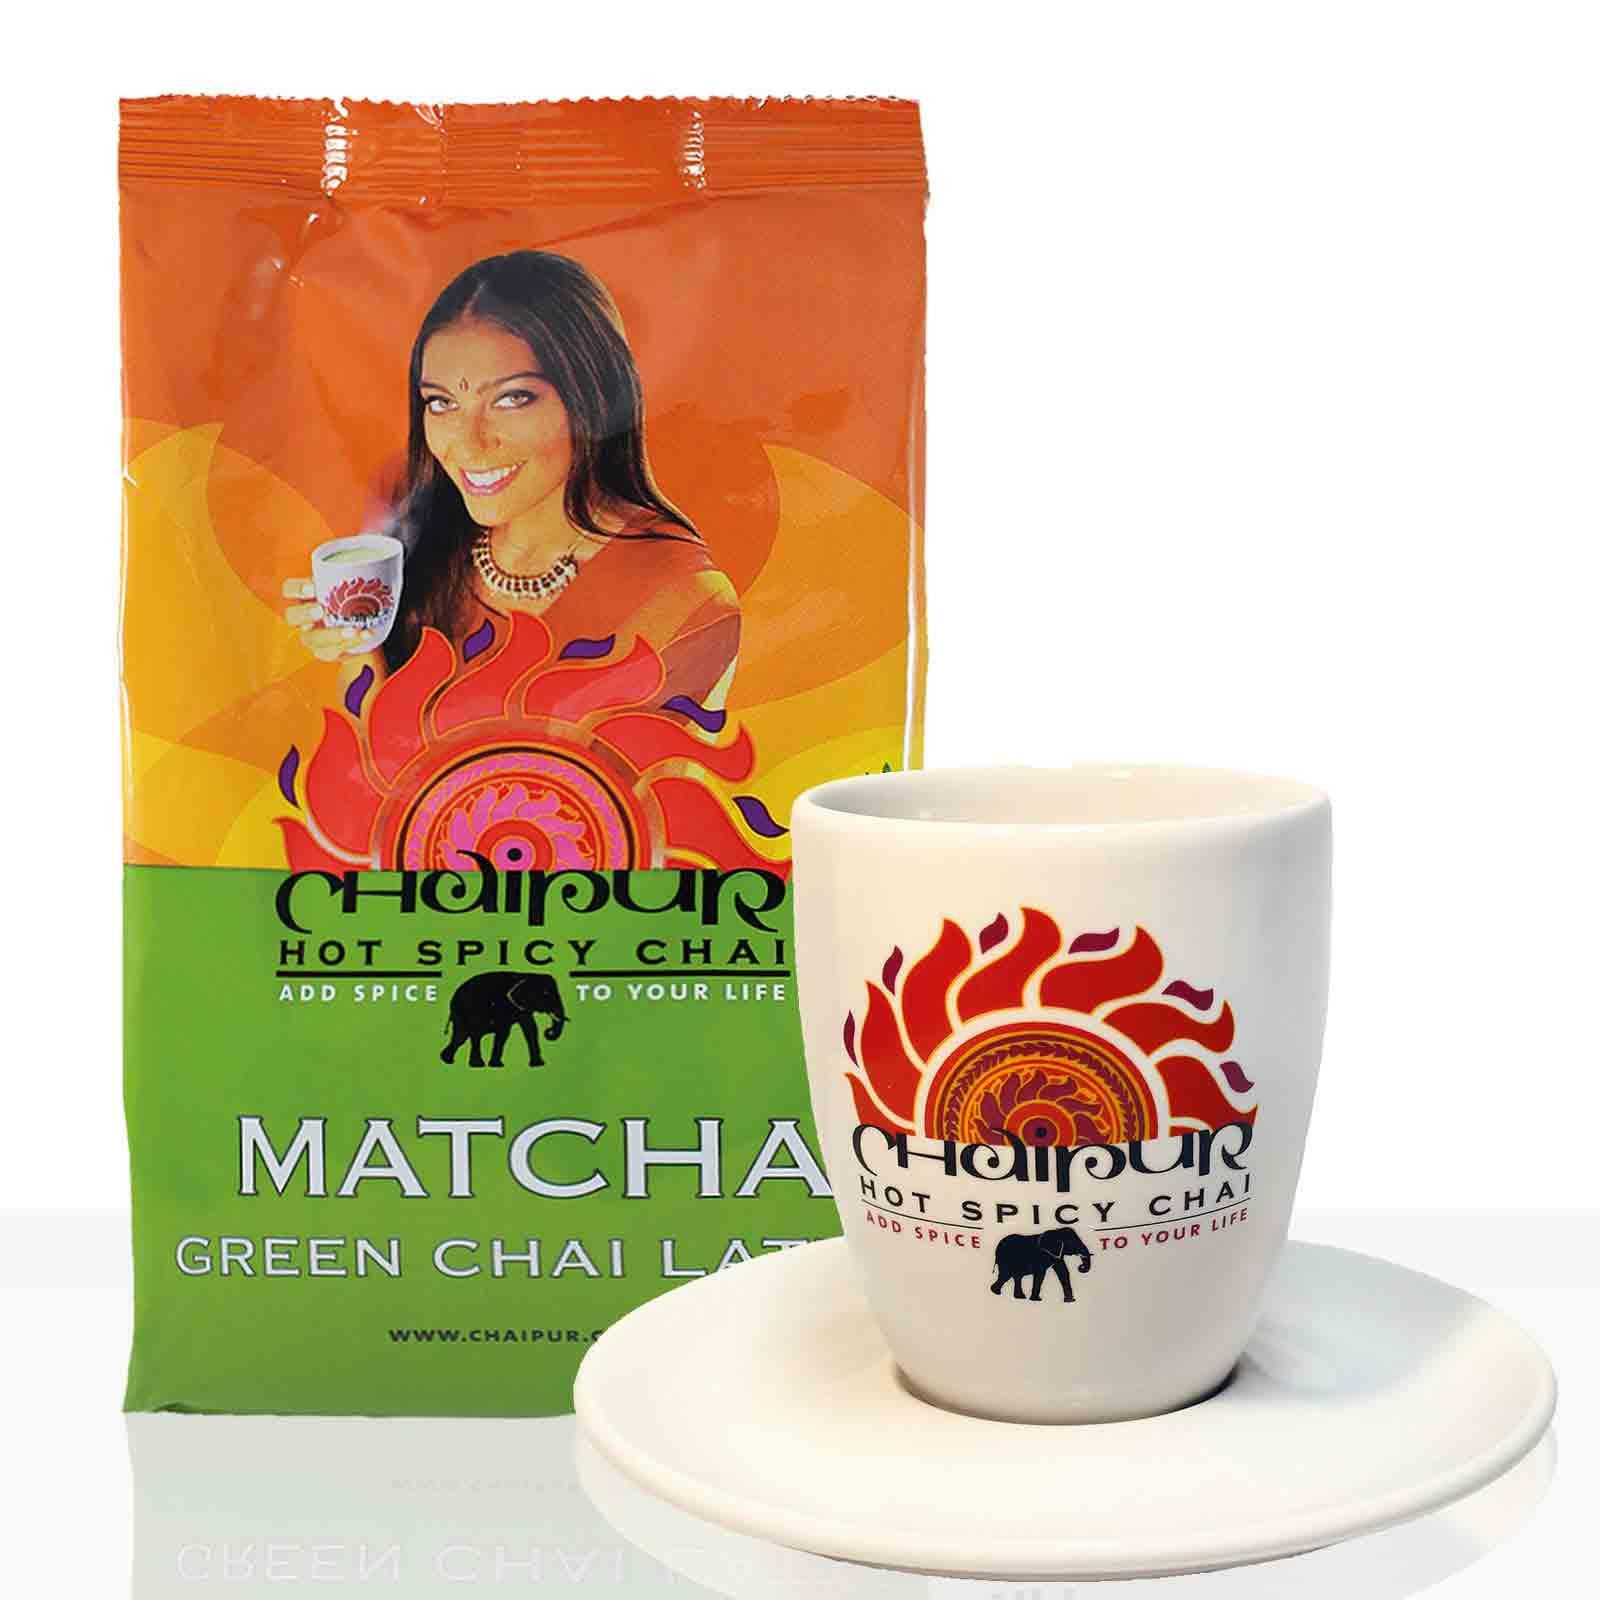 Darboven Chaipur Geschenkset inkl. Becher + Unterteller + Matcha Green Instanttee 500g